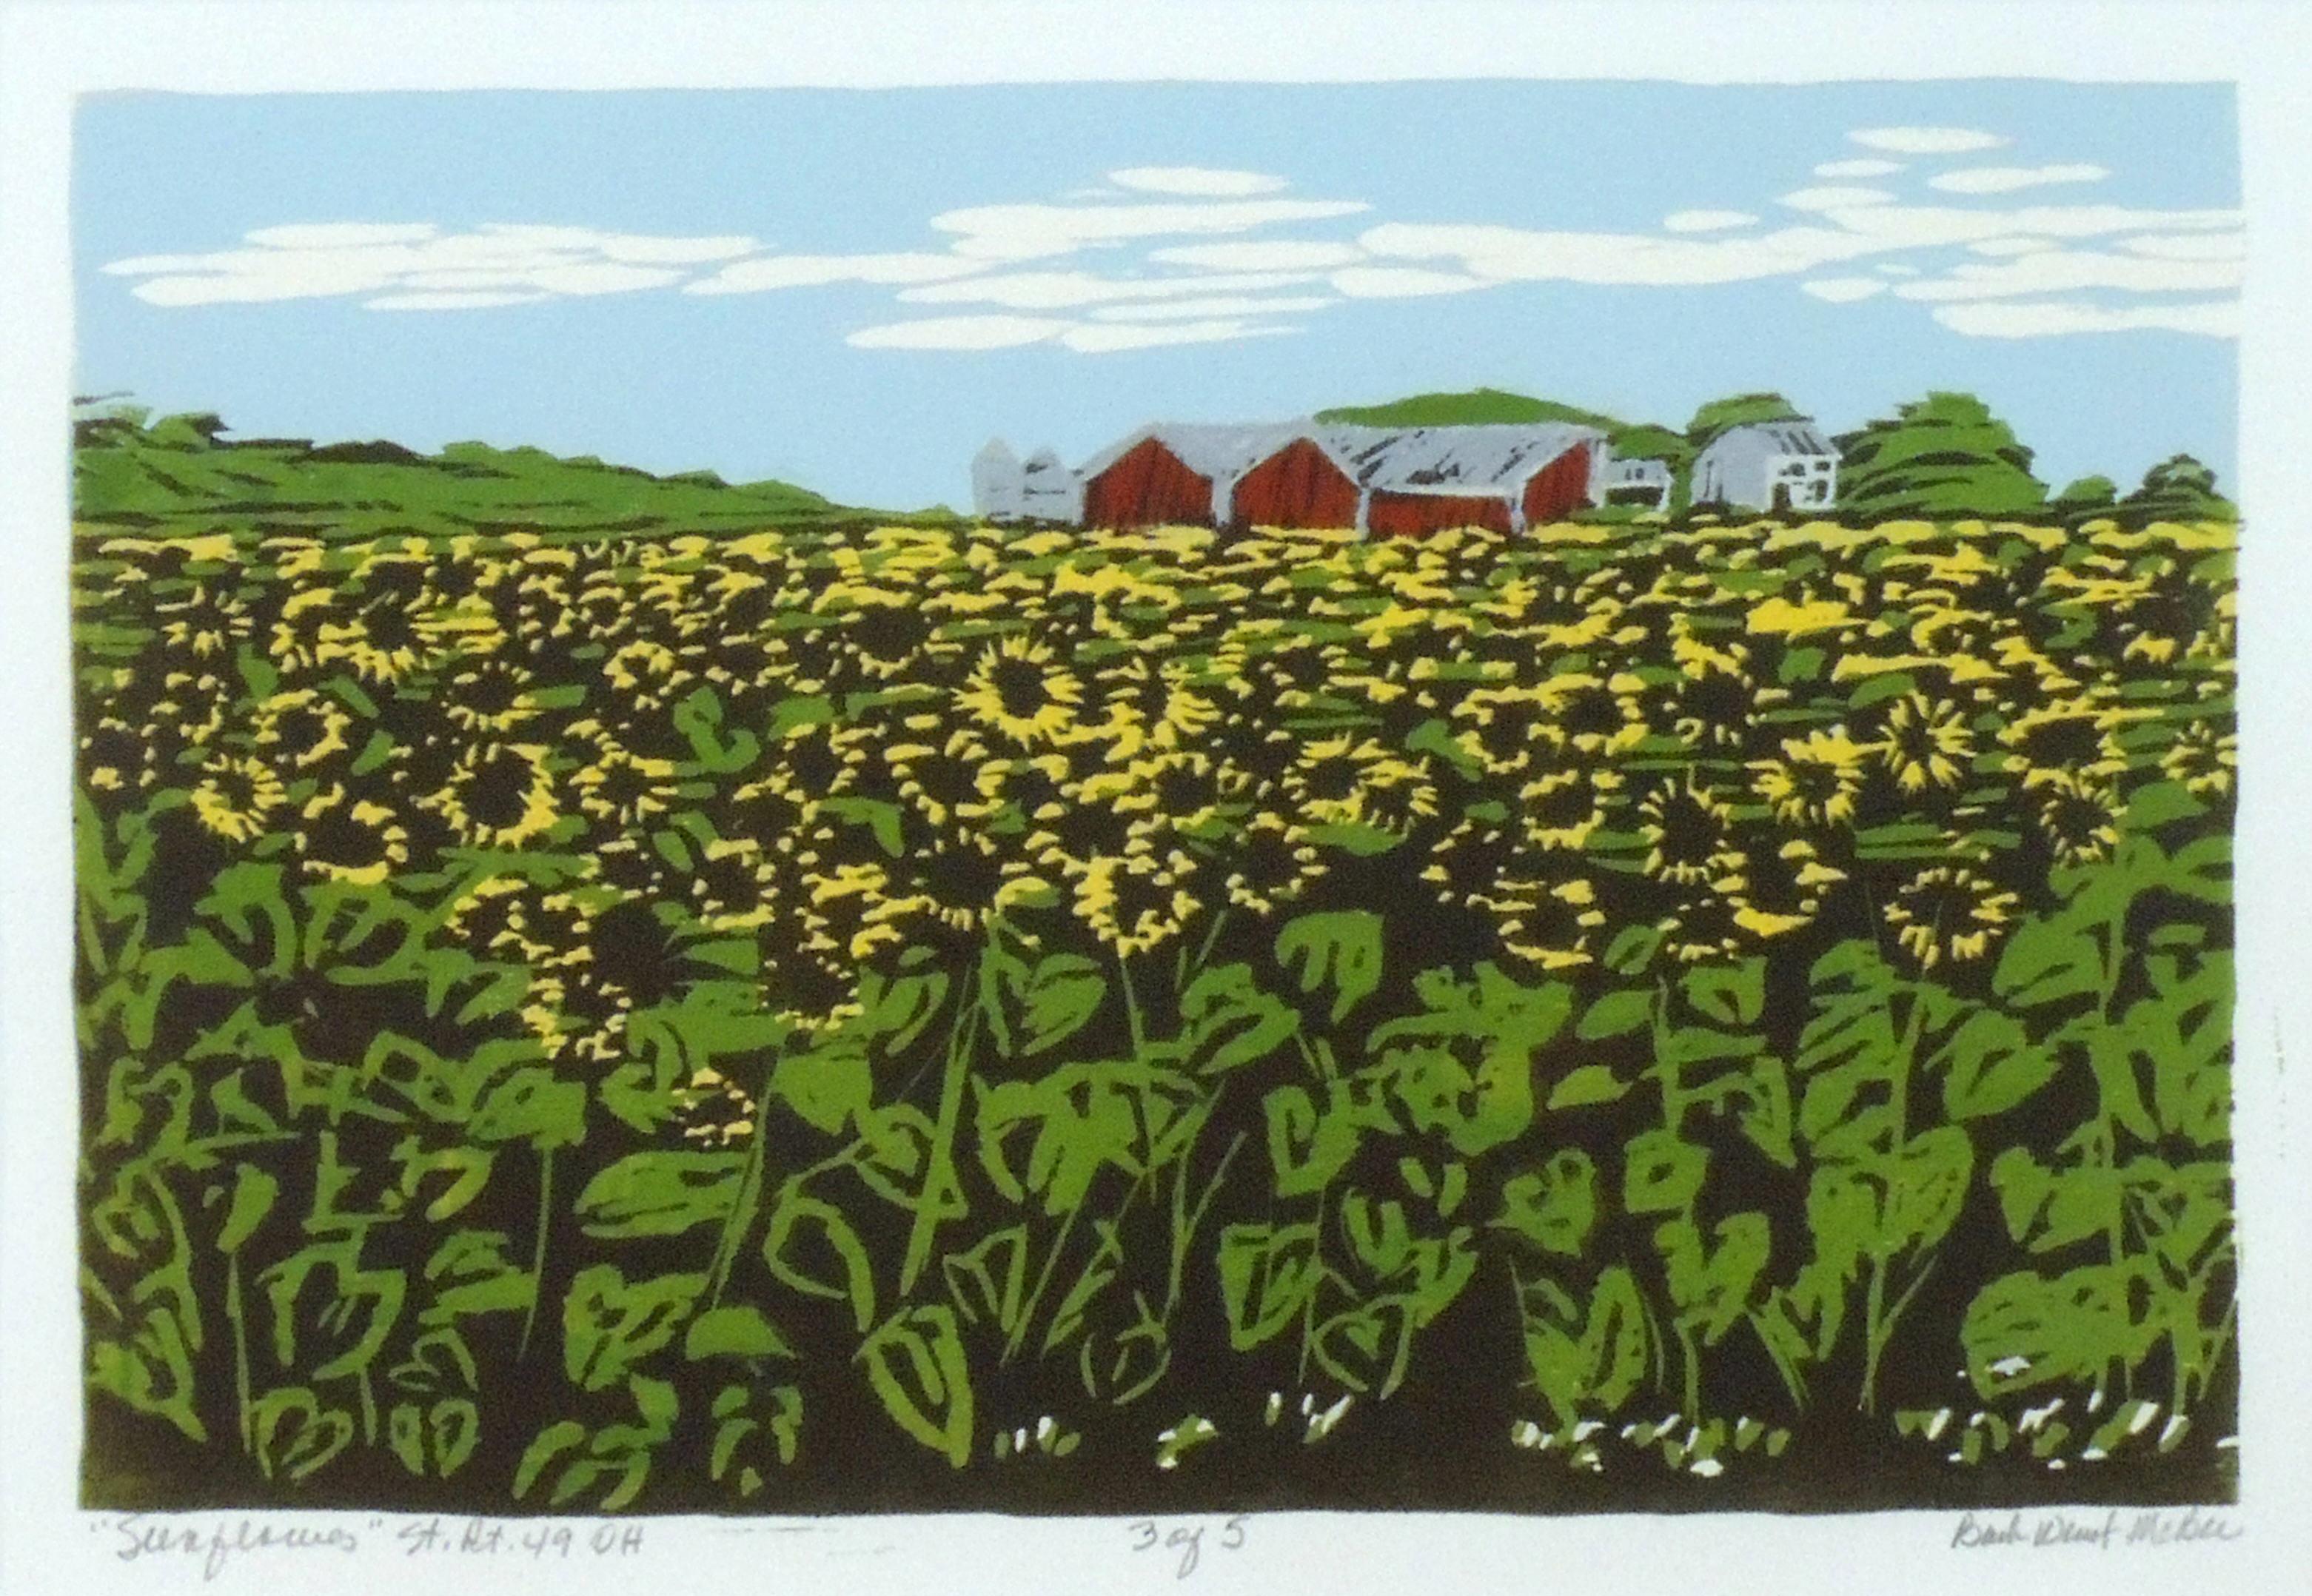 Barb Weinert-McBee | SUNFLOWERS ST 49, OHIO | Wood relief